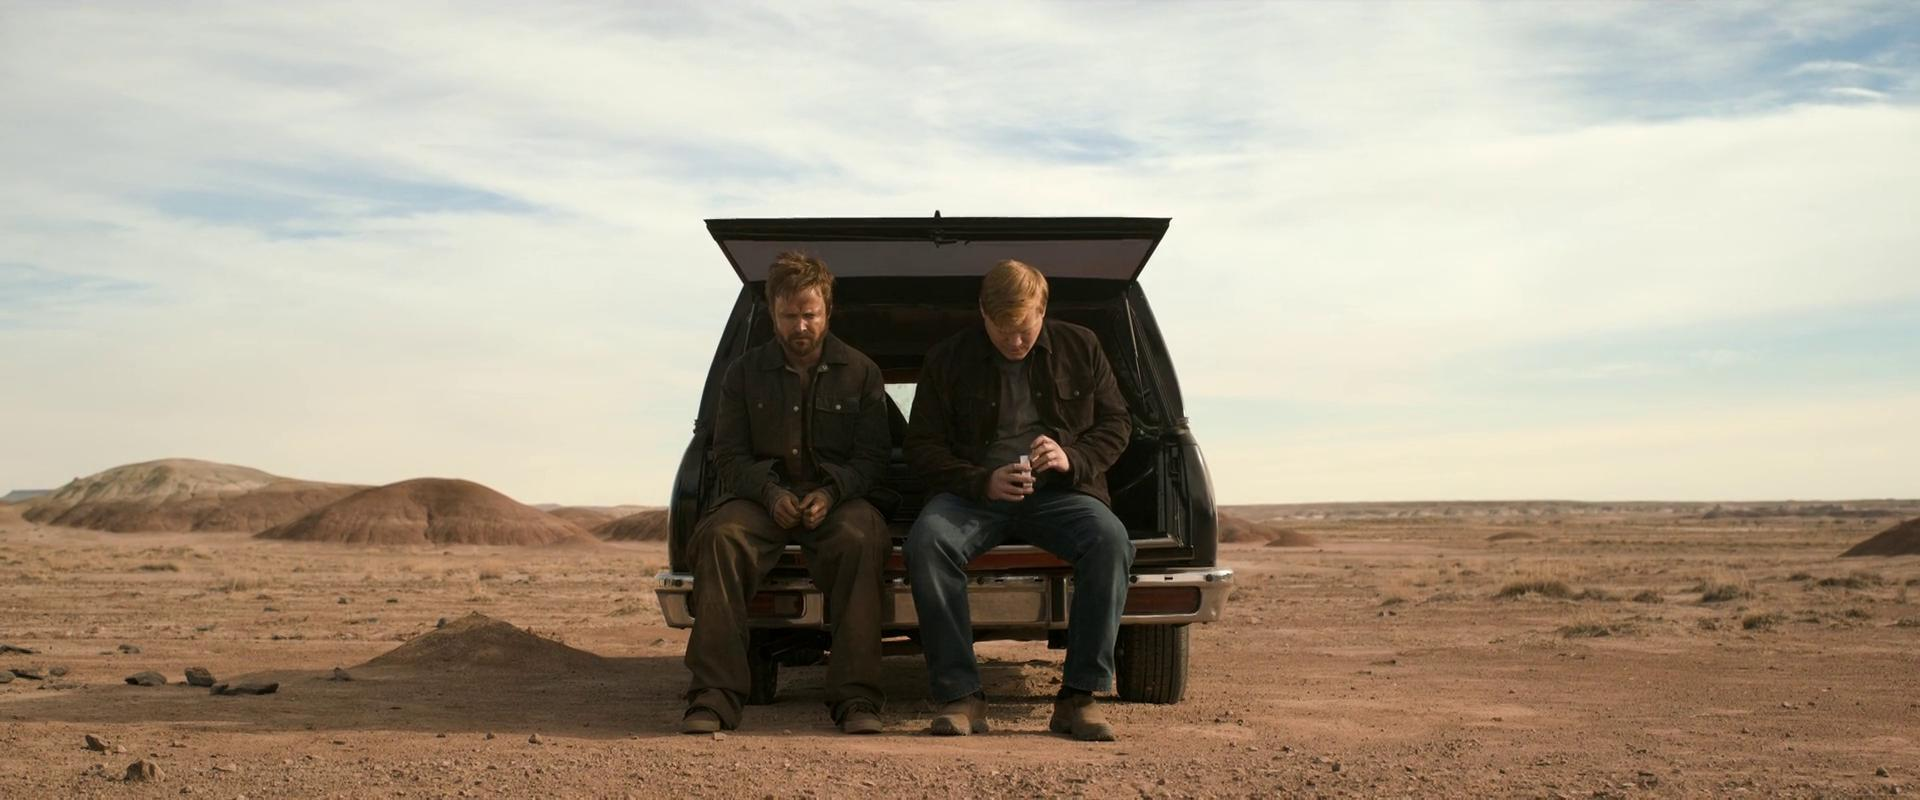 دانلود فیلم ال کامینو El Camino A Breaking Bad Movie 2019